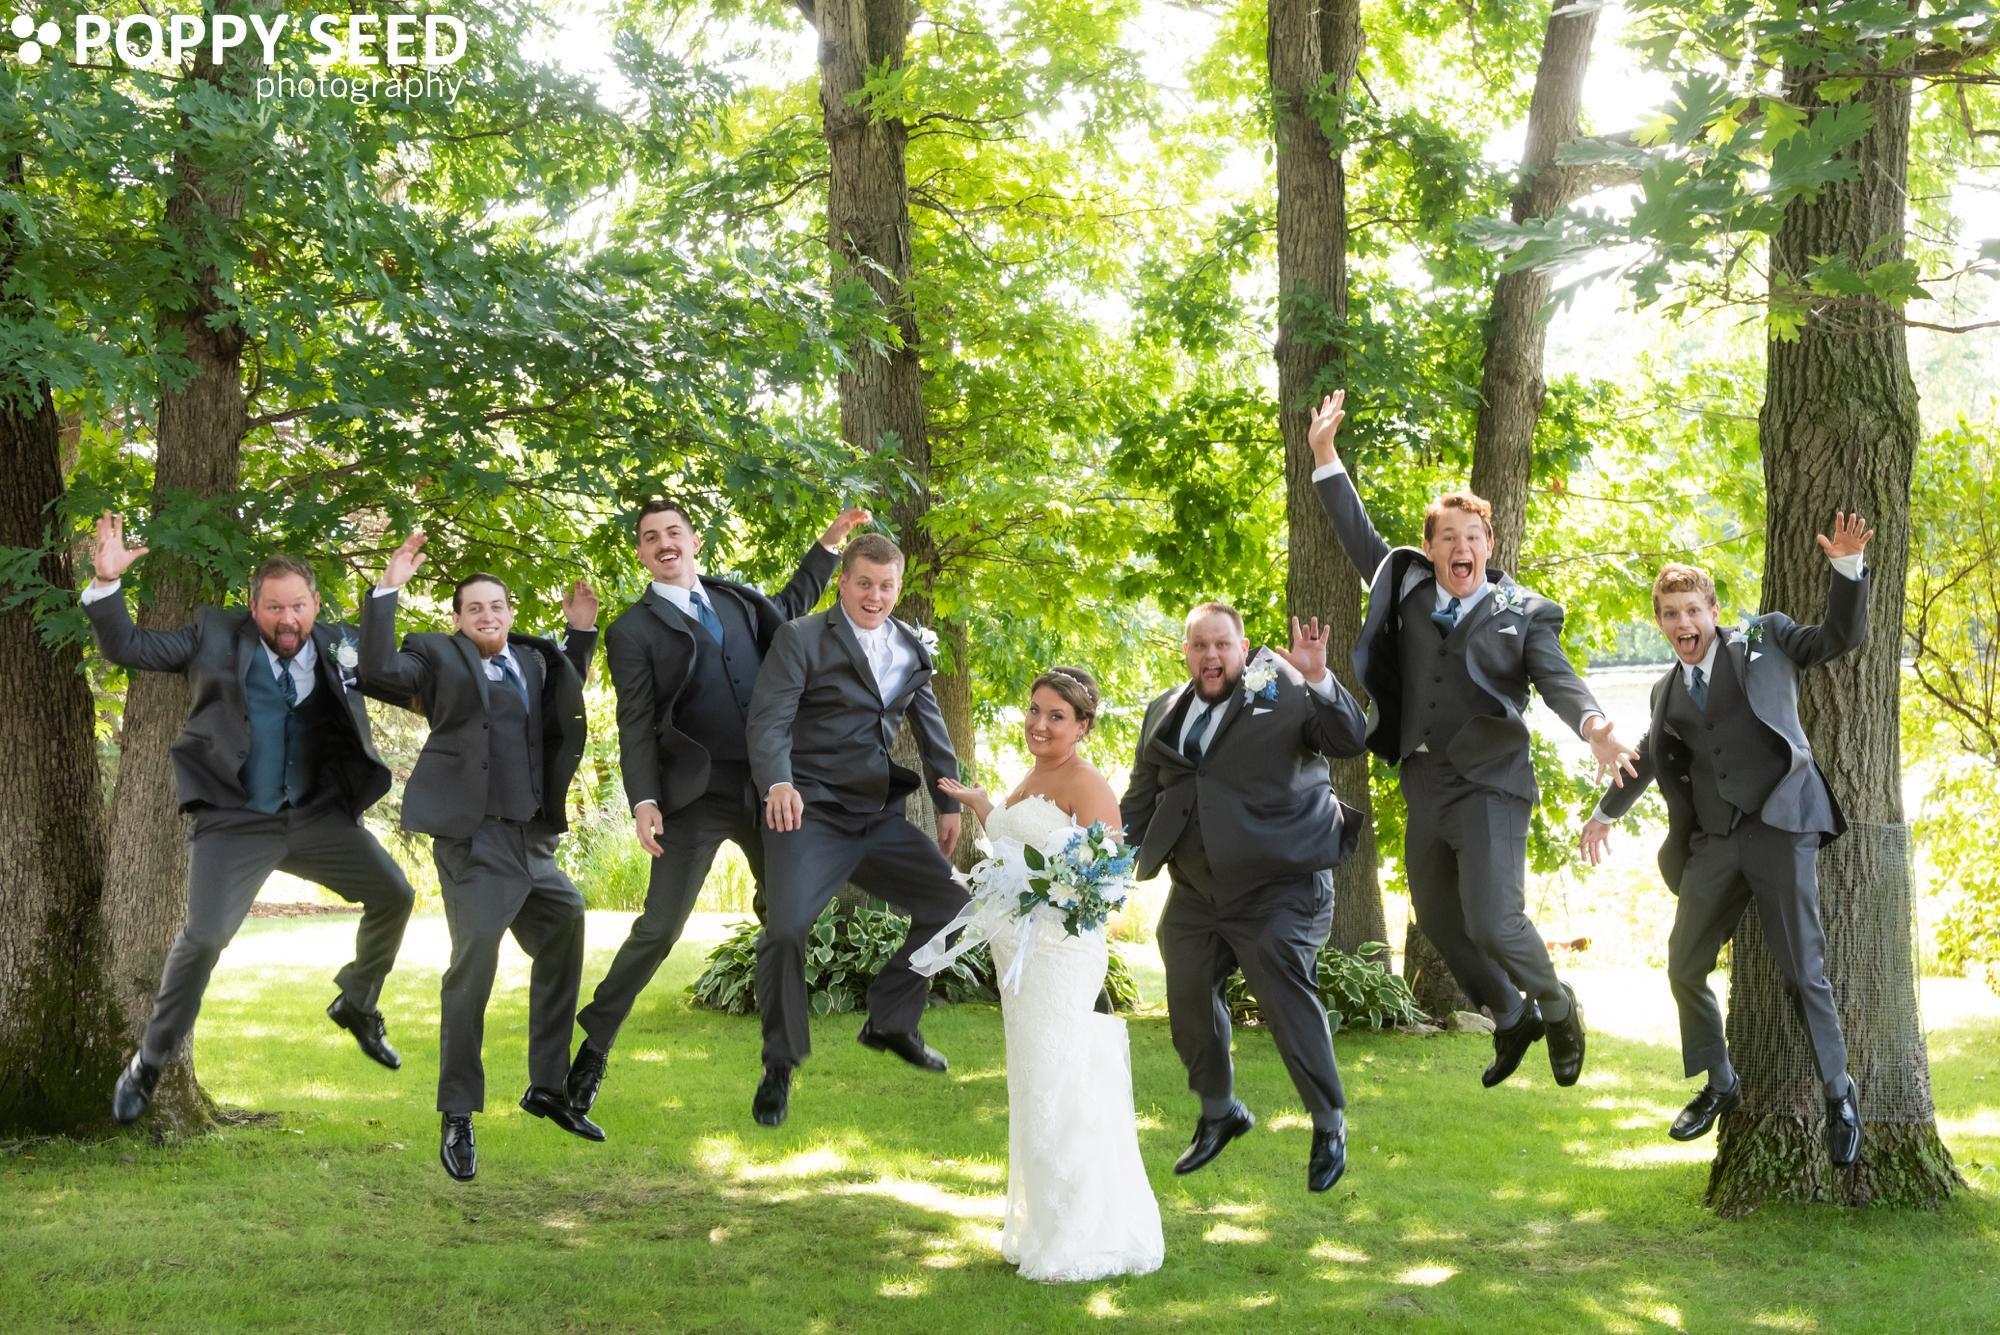 TheChartHouse_PoppySeedPhotography_Wedding_20180902_0382.jpg